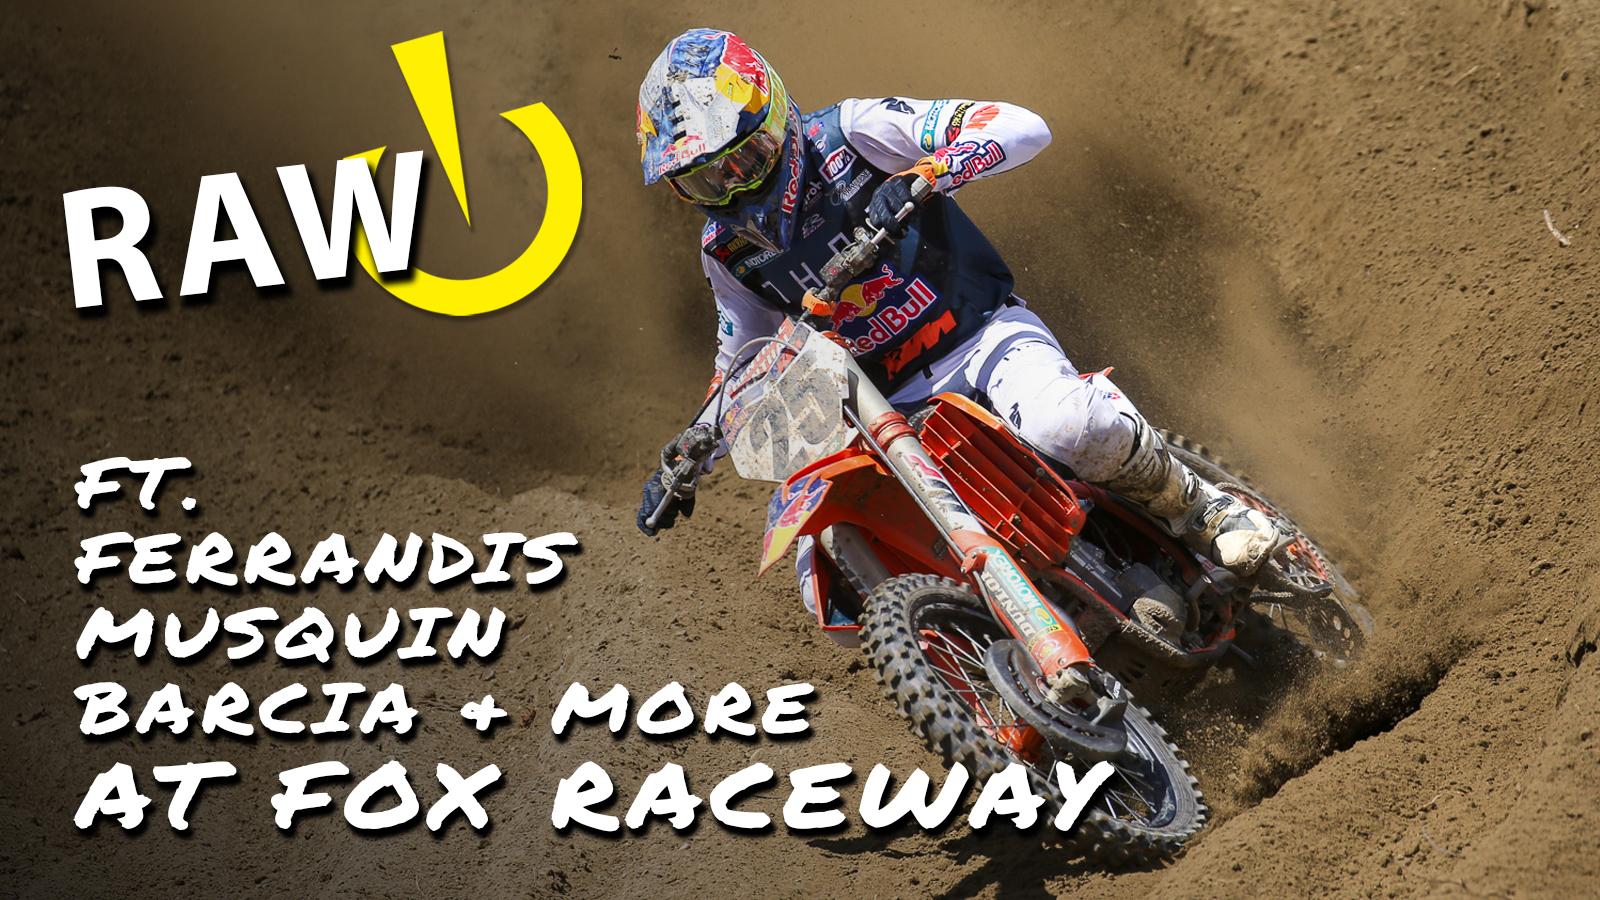 RAW   Ferrandis, Musquin, Barcia & More at Fox Raceway